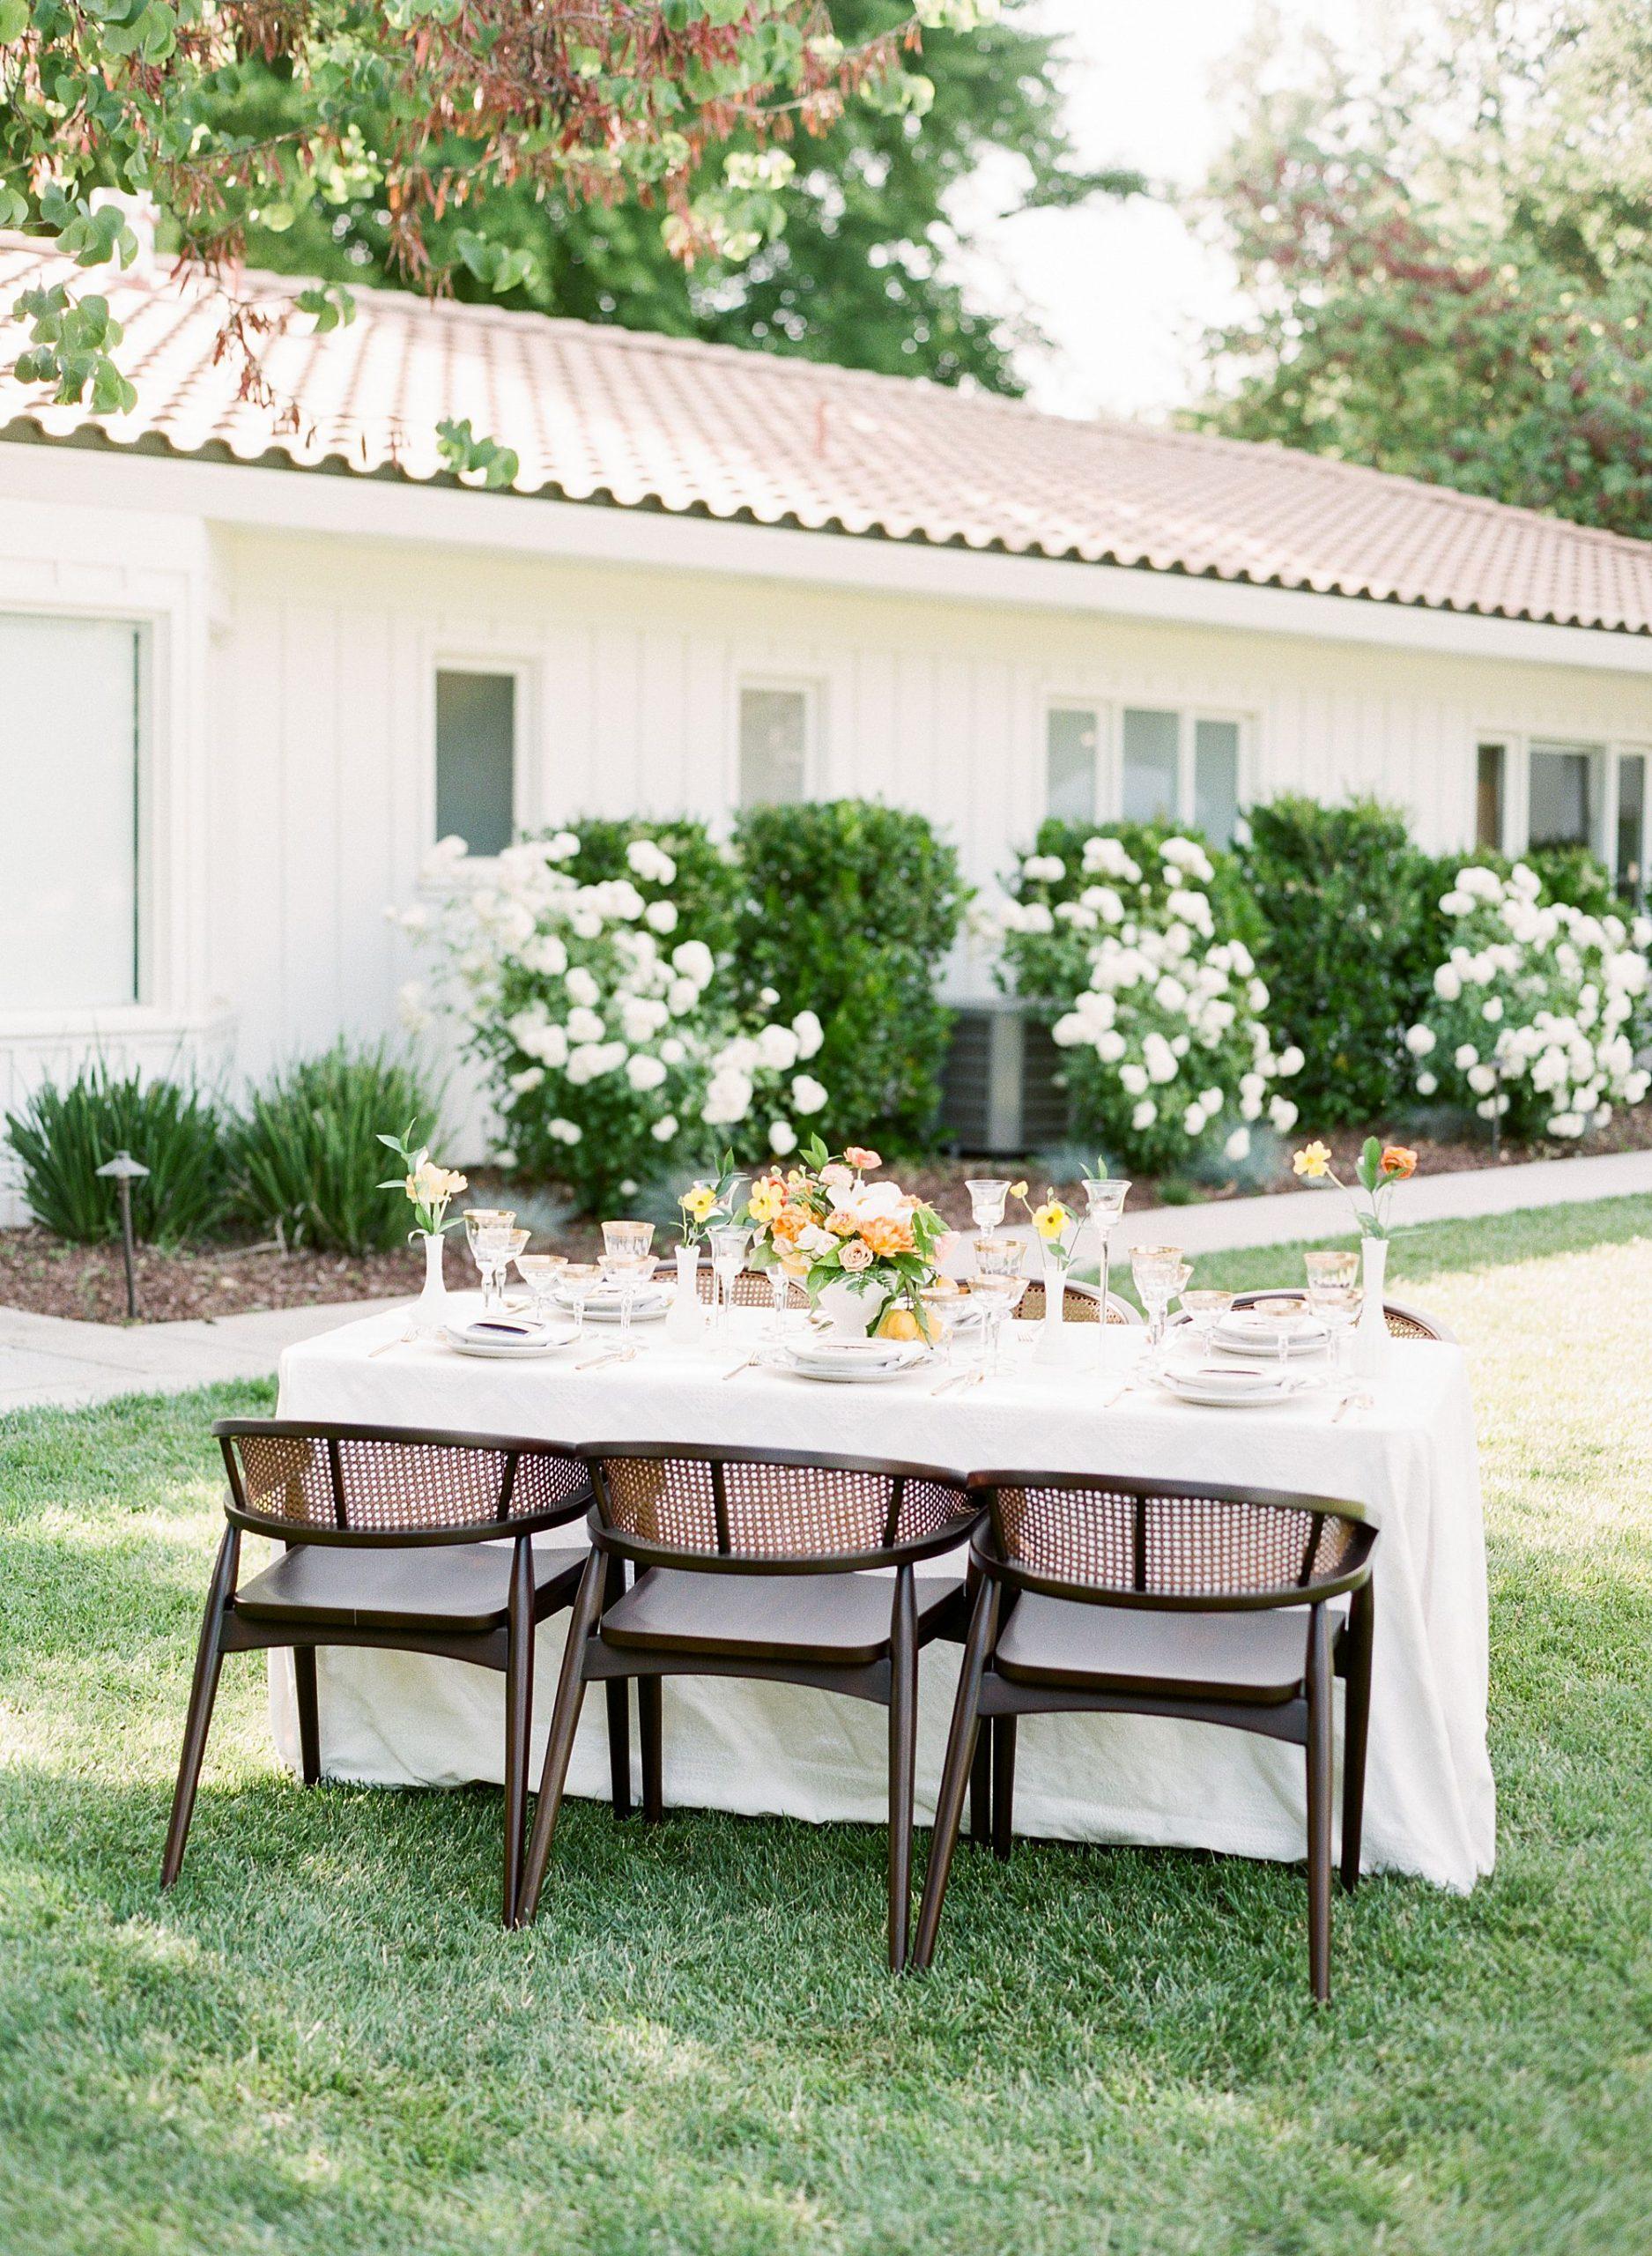 Italian Wedding Inspiration at The Maples Wedding & Event Center - Featured on Wedding Chicks - Ashley Baumgartner - Sacramento Wedding Phtoographer_0003.jpg